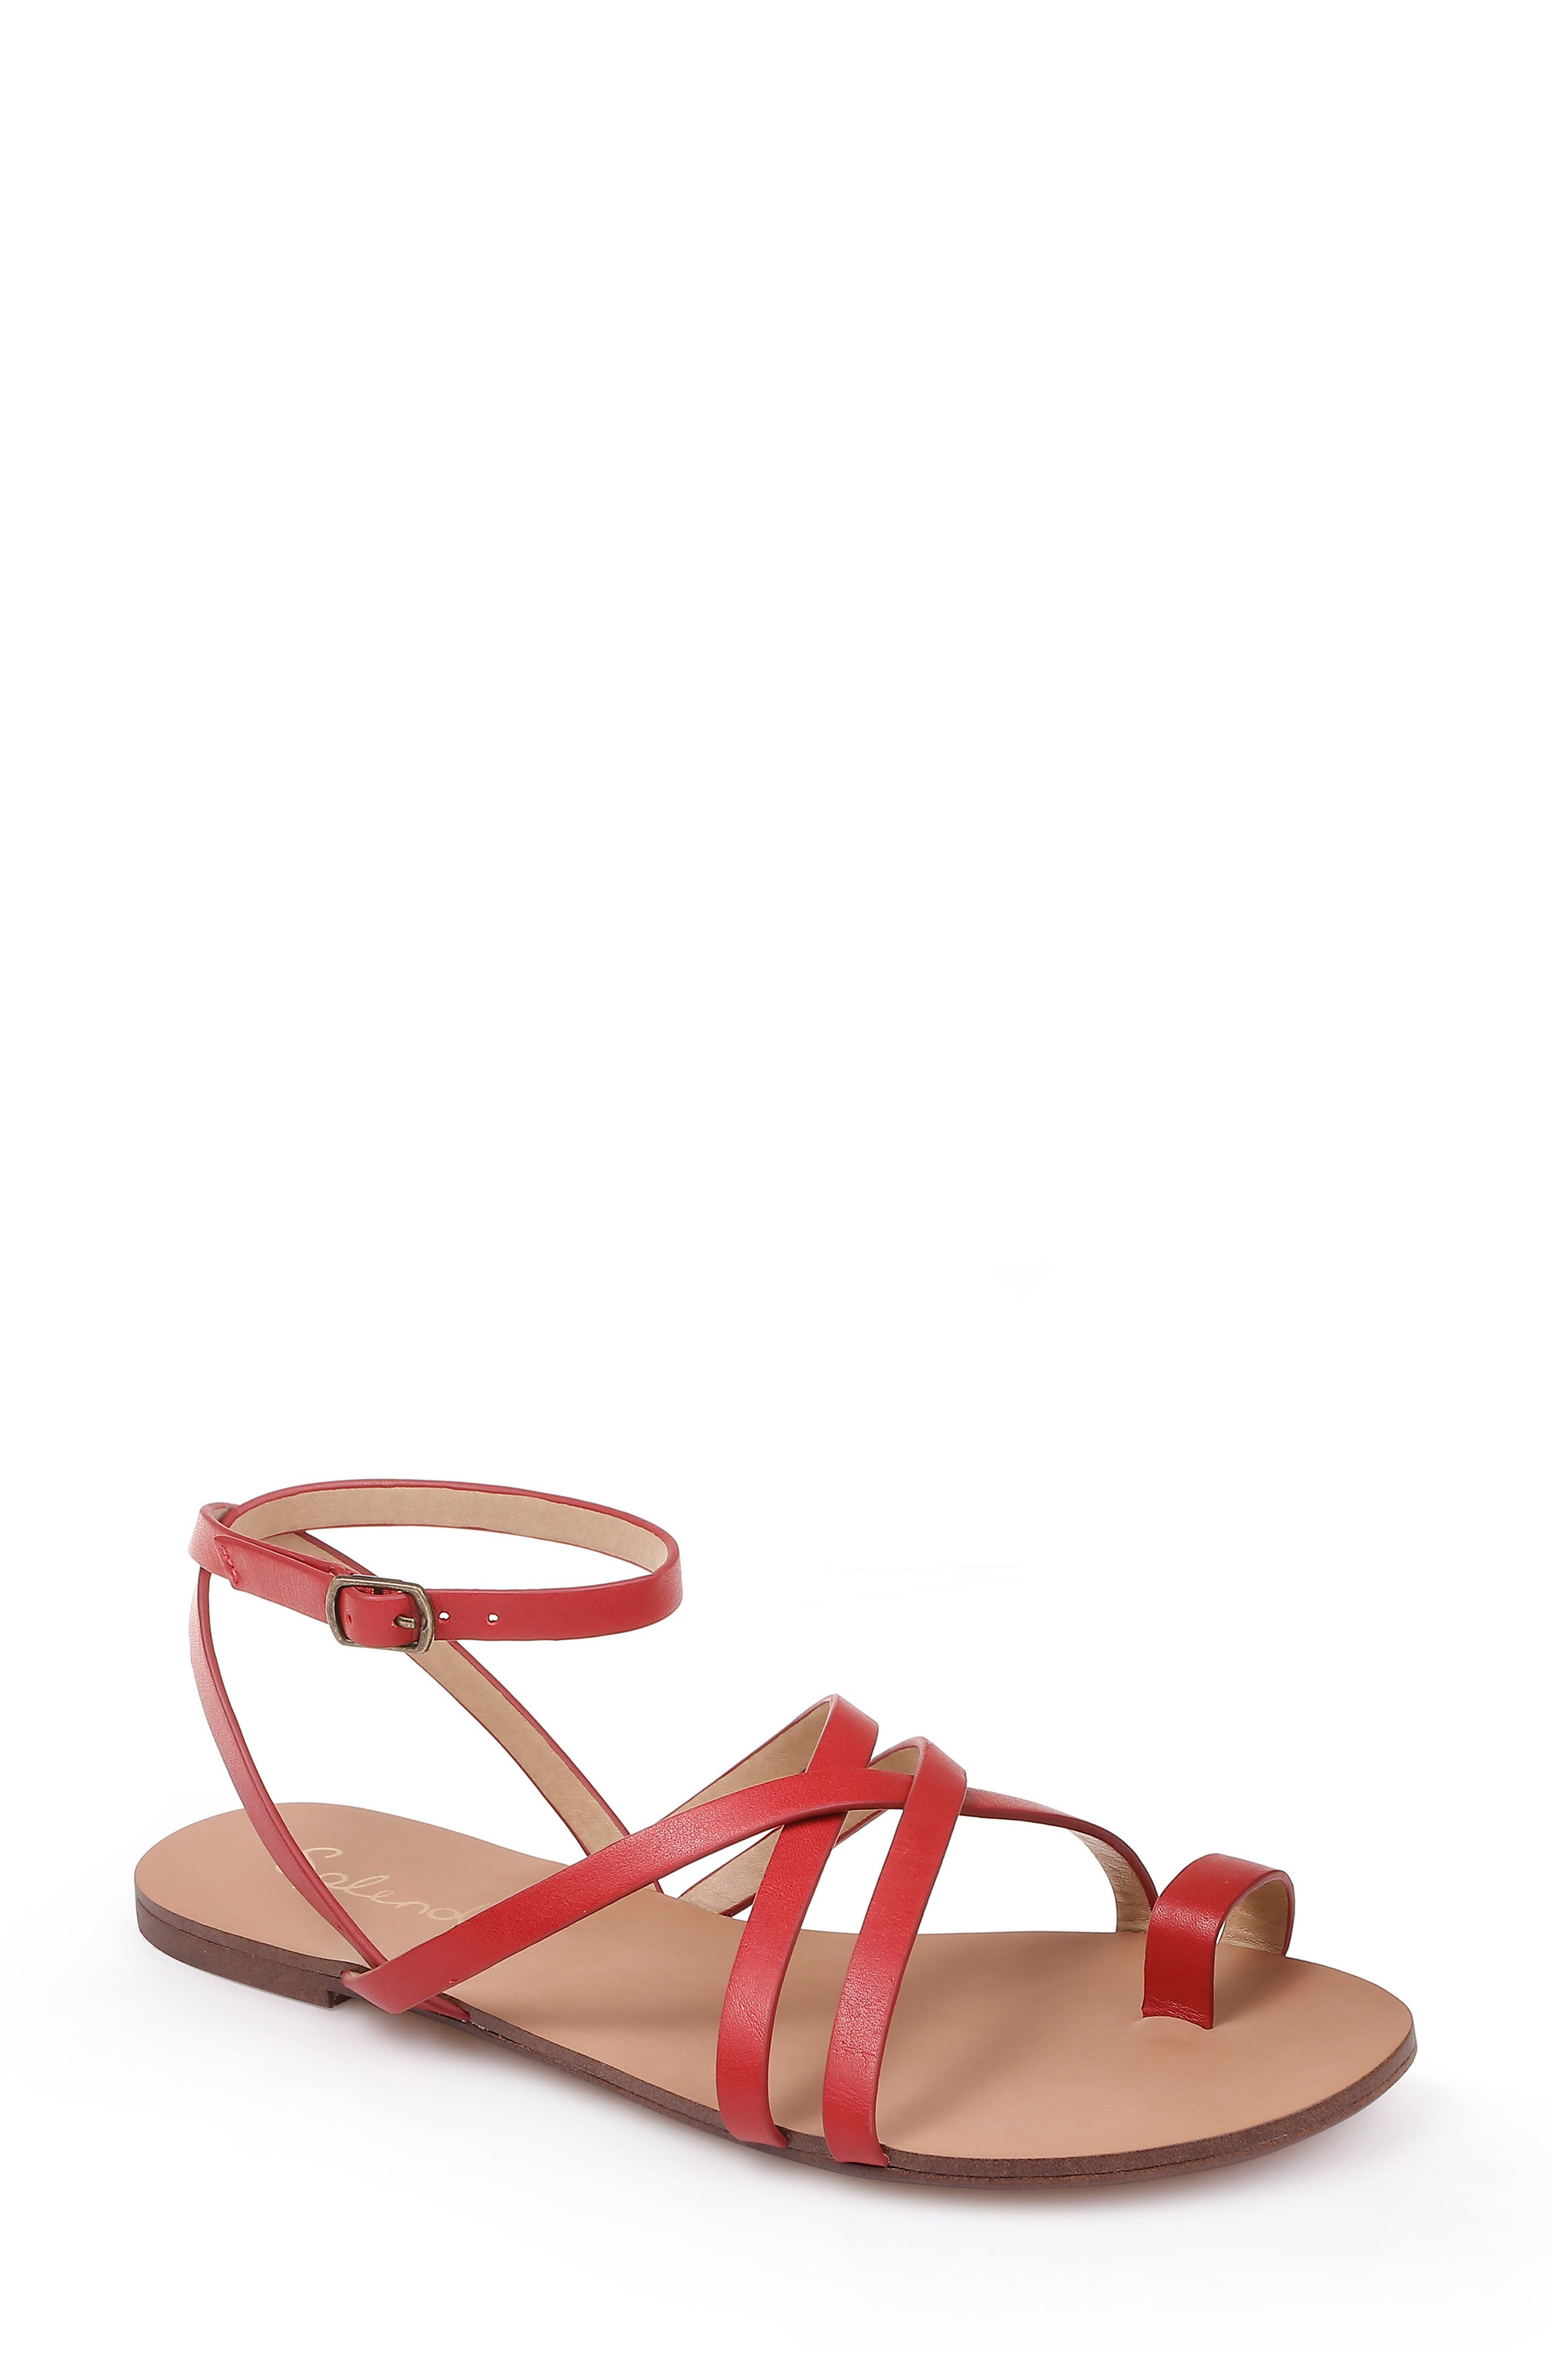 Splendid Sully Strappy Toe Loop Sandal, Red